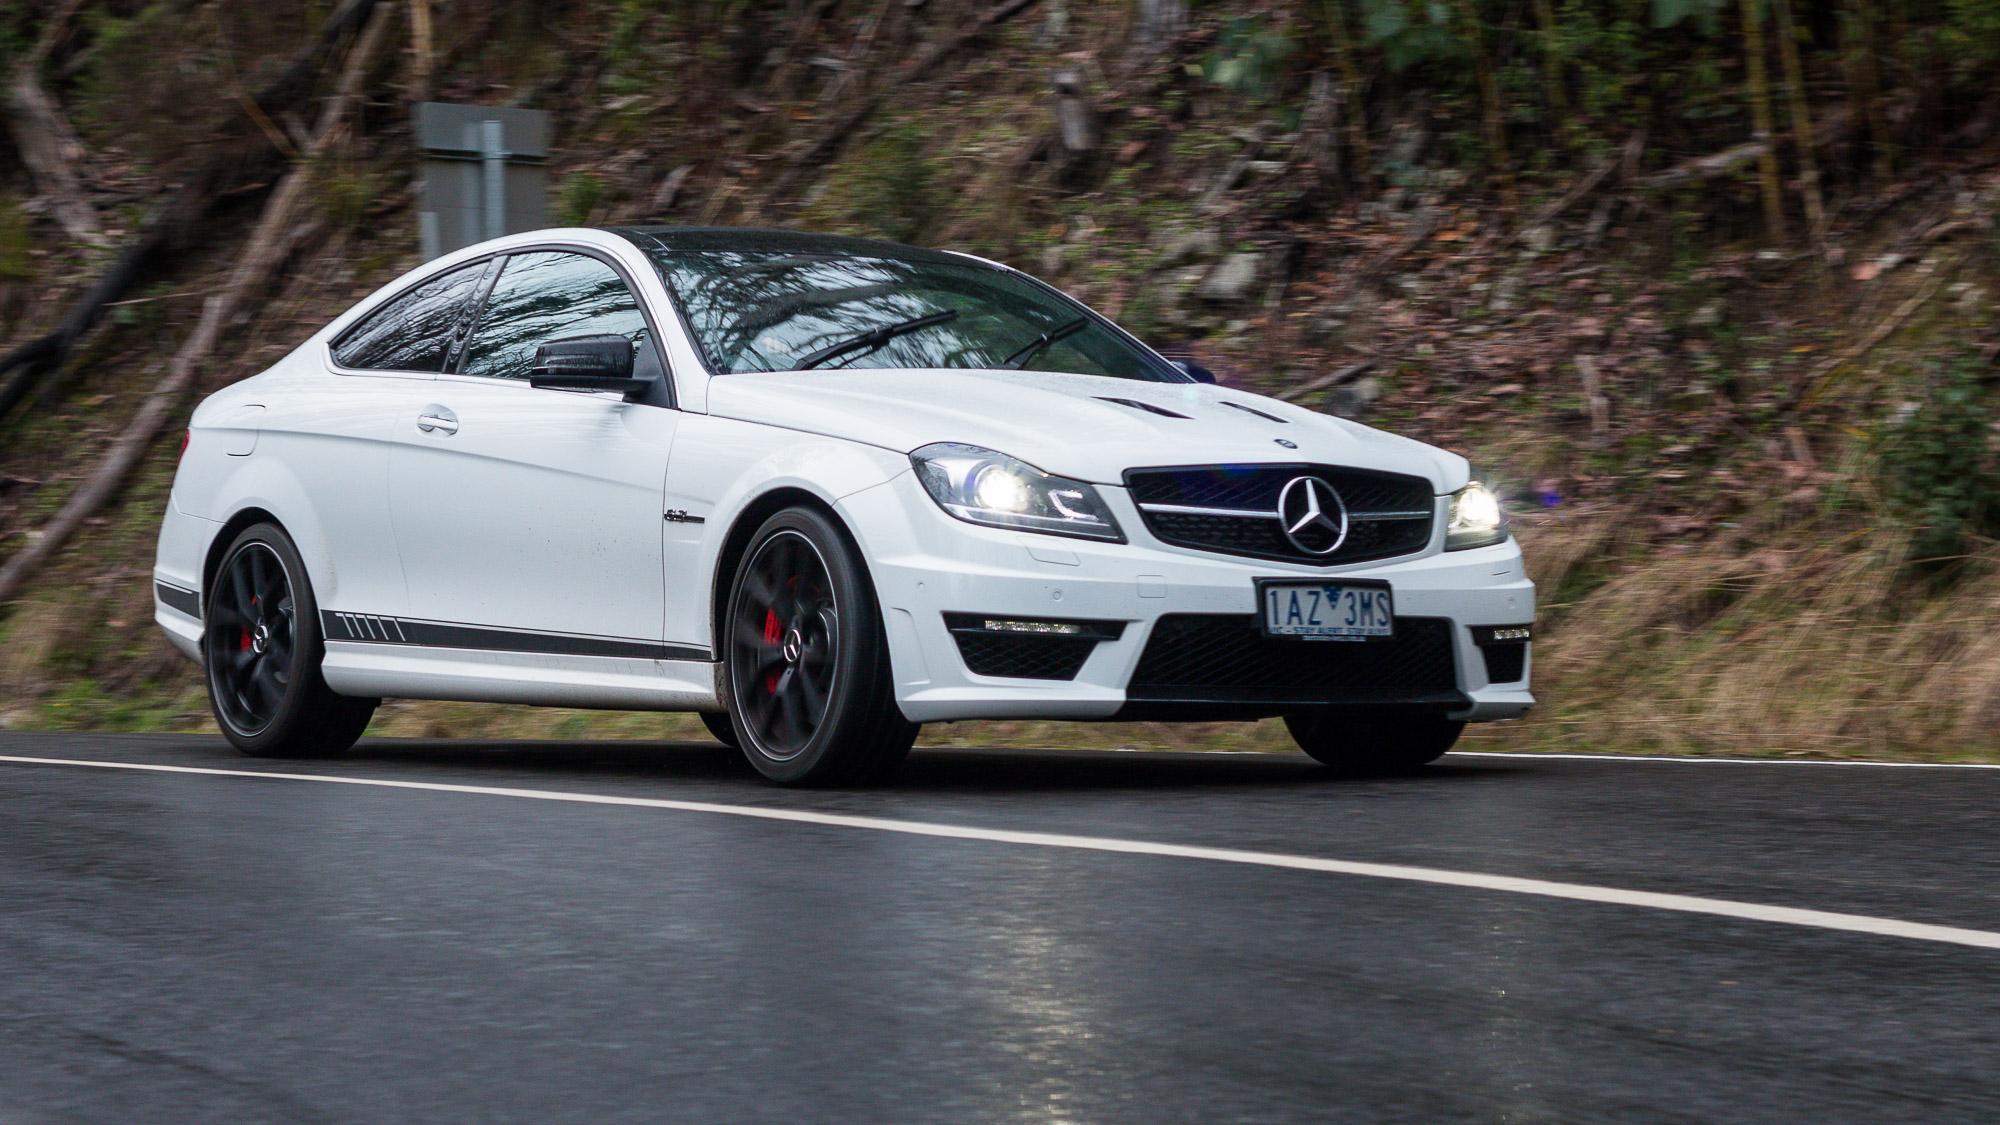 Bmw m4 v mercedes benz c63 amg edition 507 comparison for Mercedes benz c63